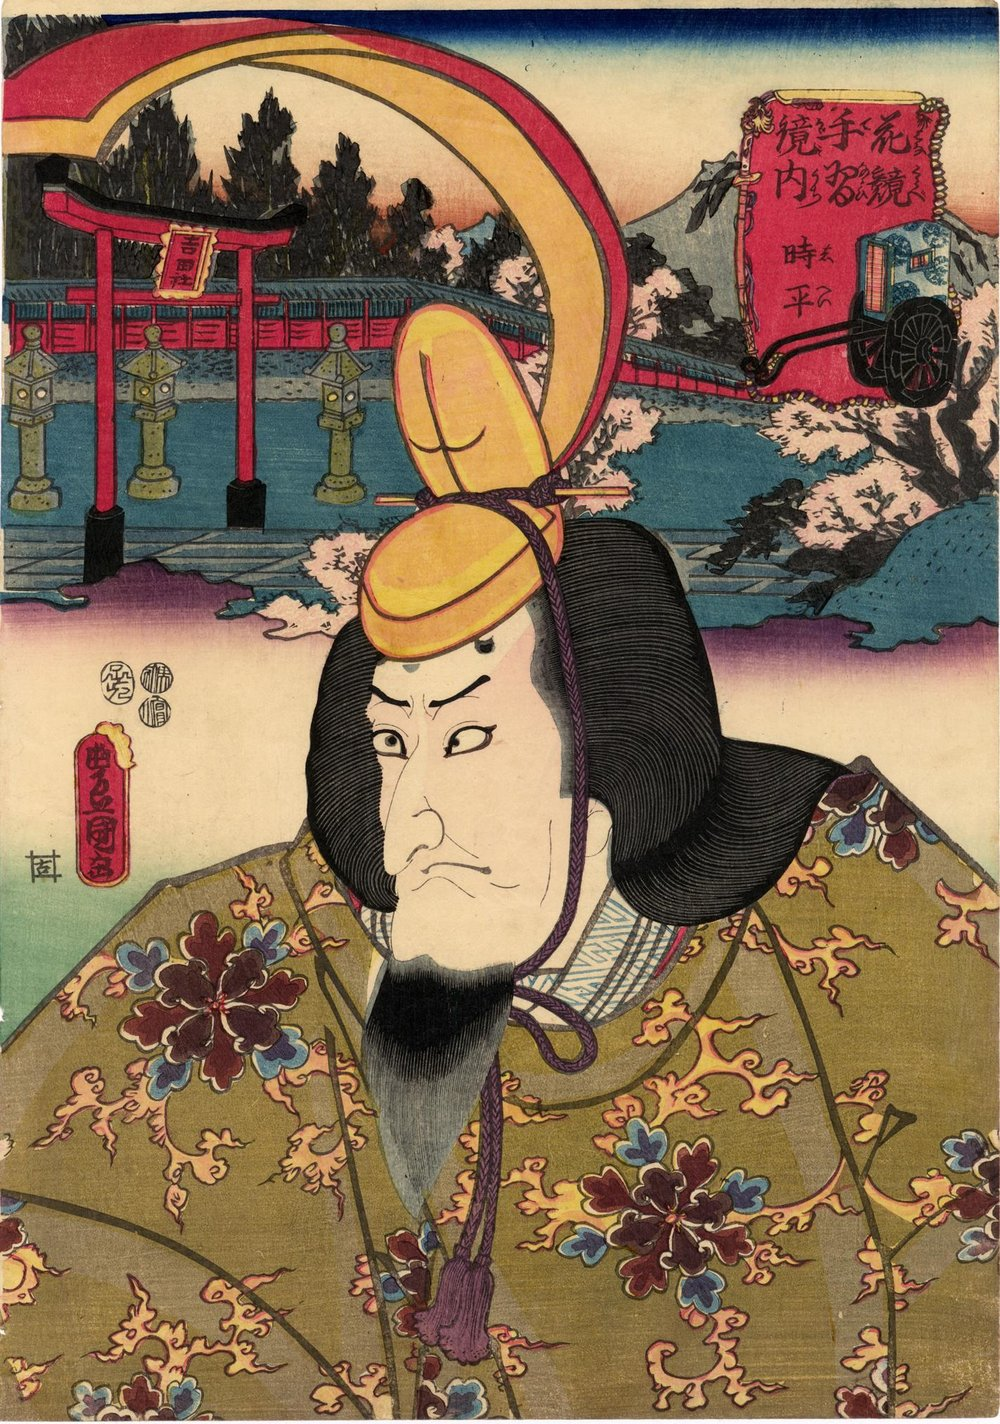 Utagawa Kinisada, Kabuki Sugawara's Secrets of Calligraphy, 1852. $250